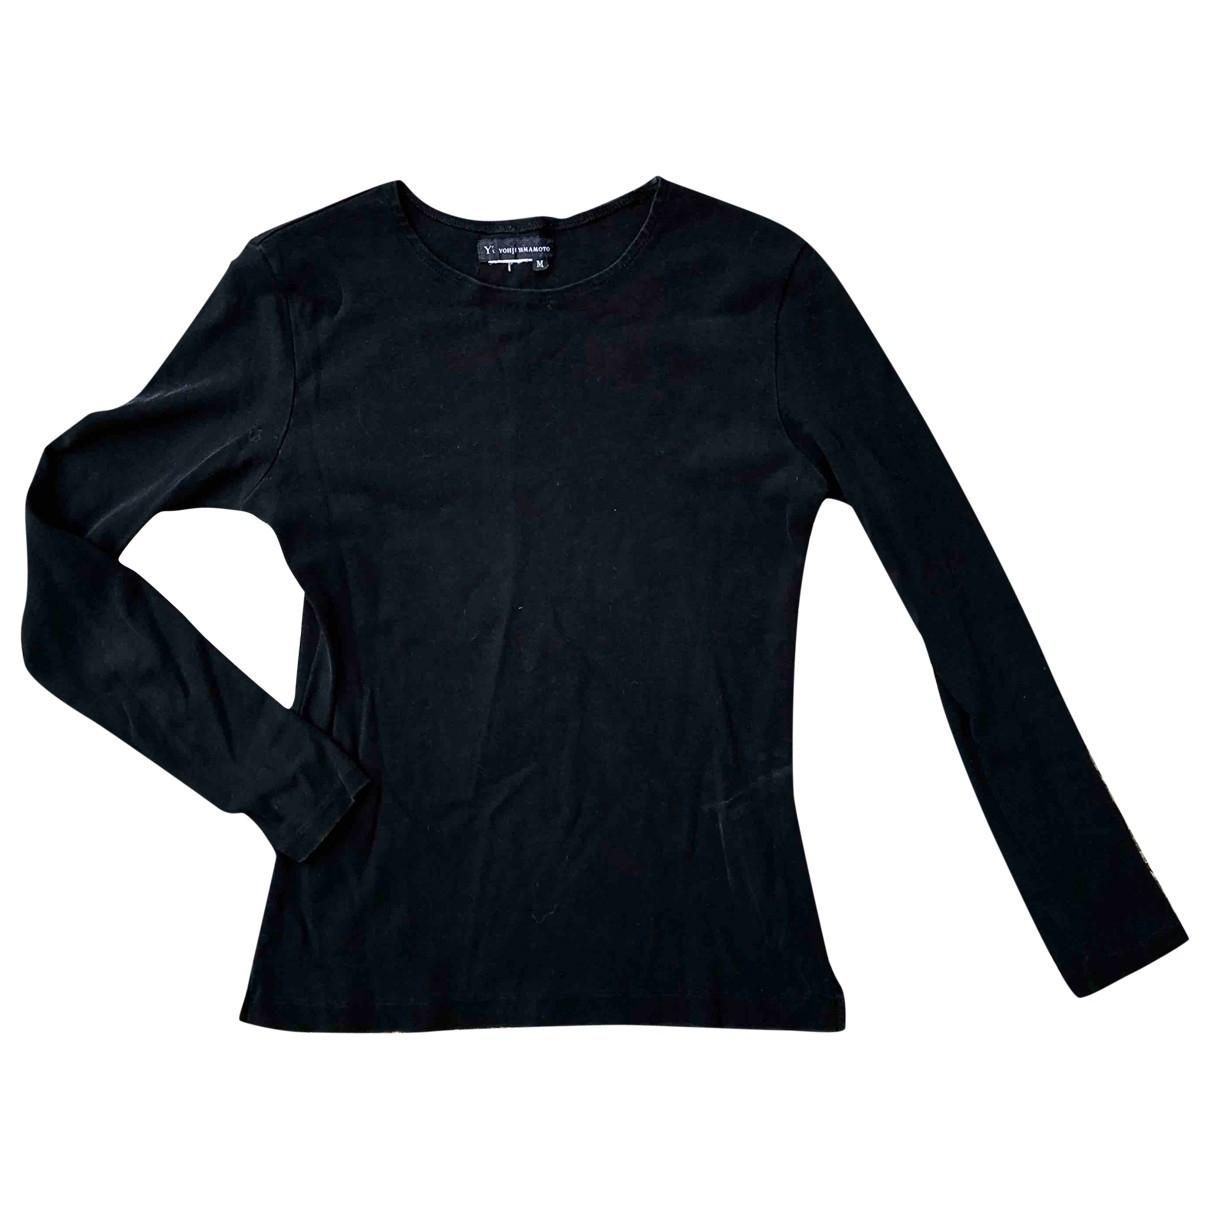 Yohji Yamamoto - Top   pour femme en coton - noir